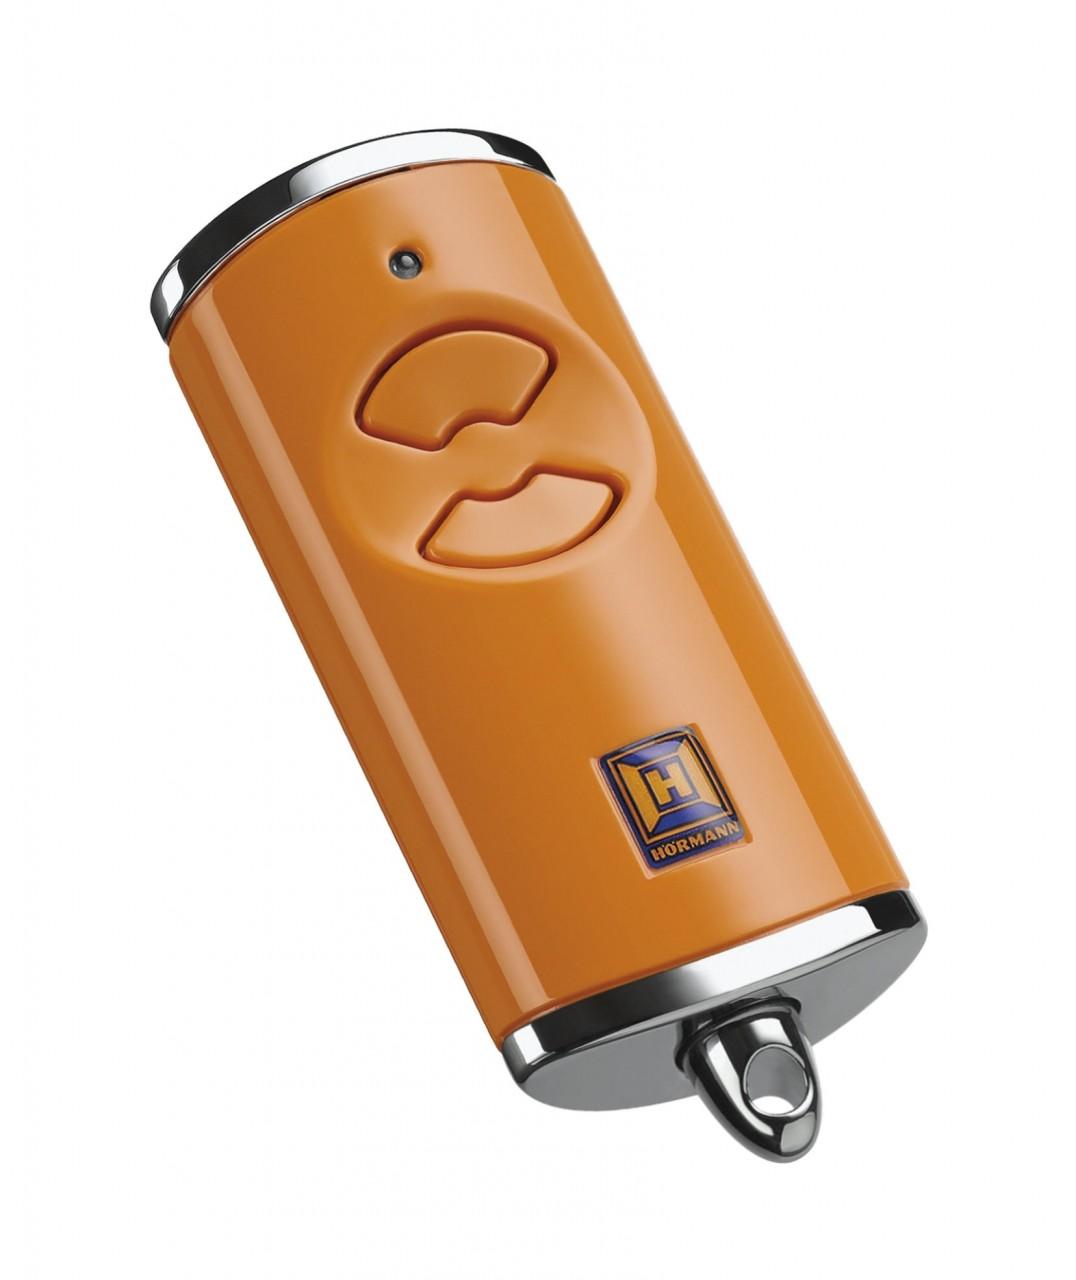 Hörmann Handsender HSE 2 868 MHz BiSecur orange